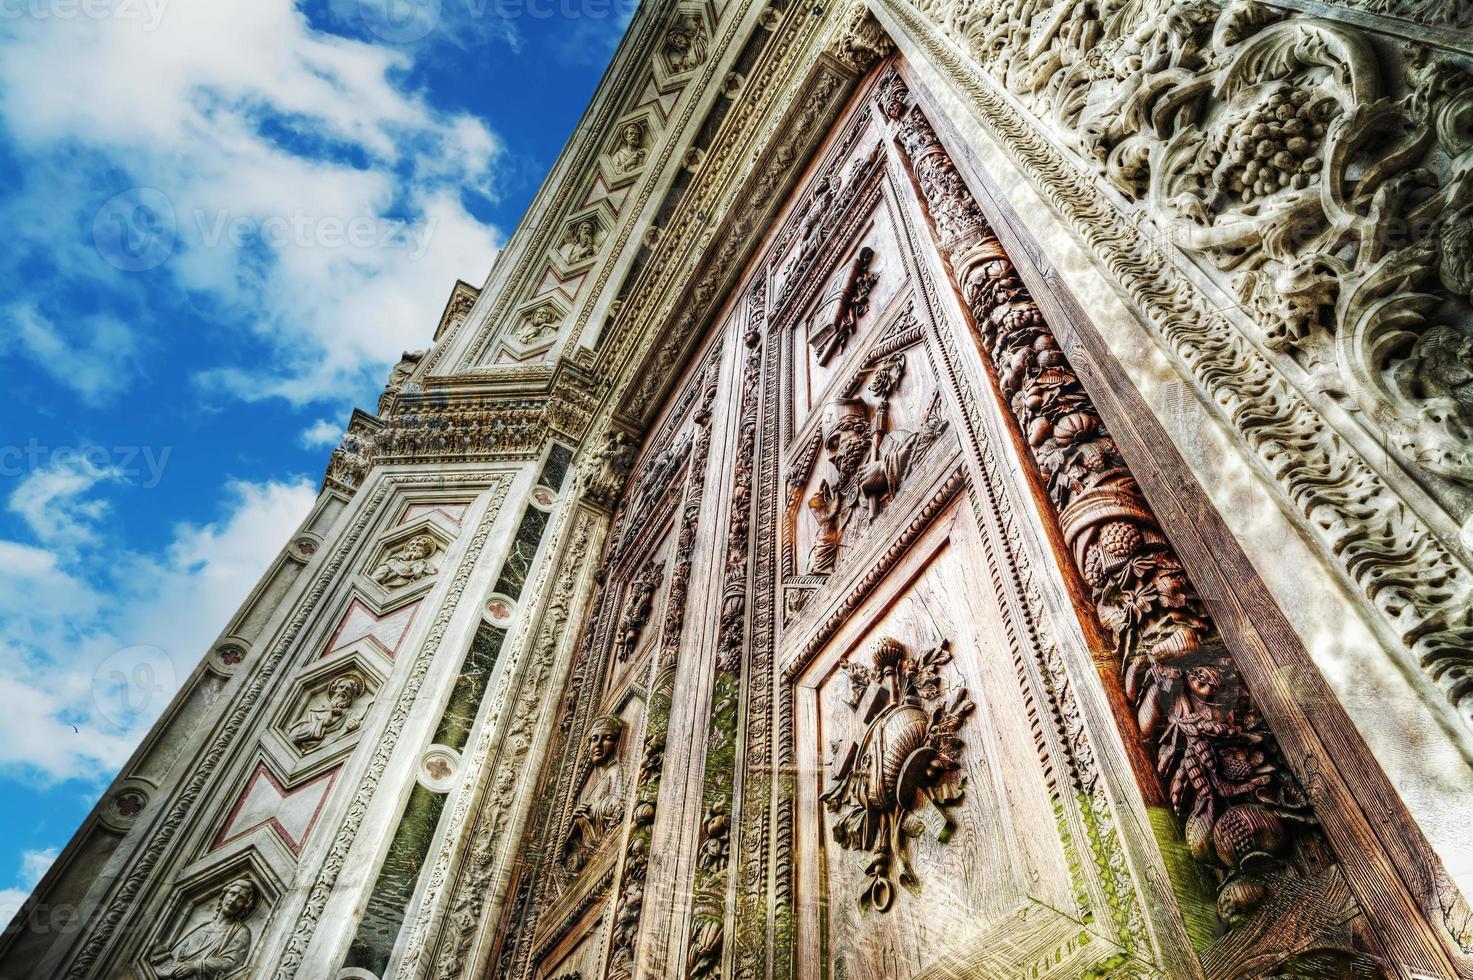 Santa Croce kathedraal onder een blauwe hemel met wolken foto